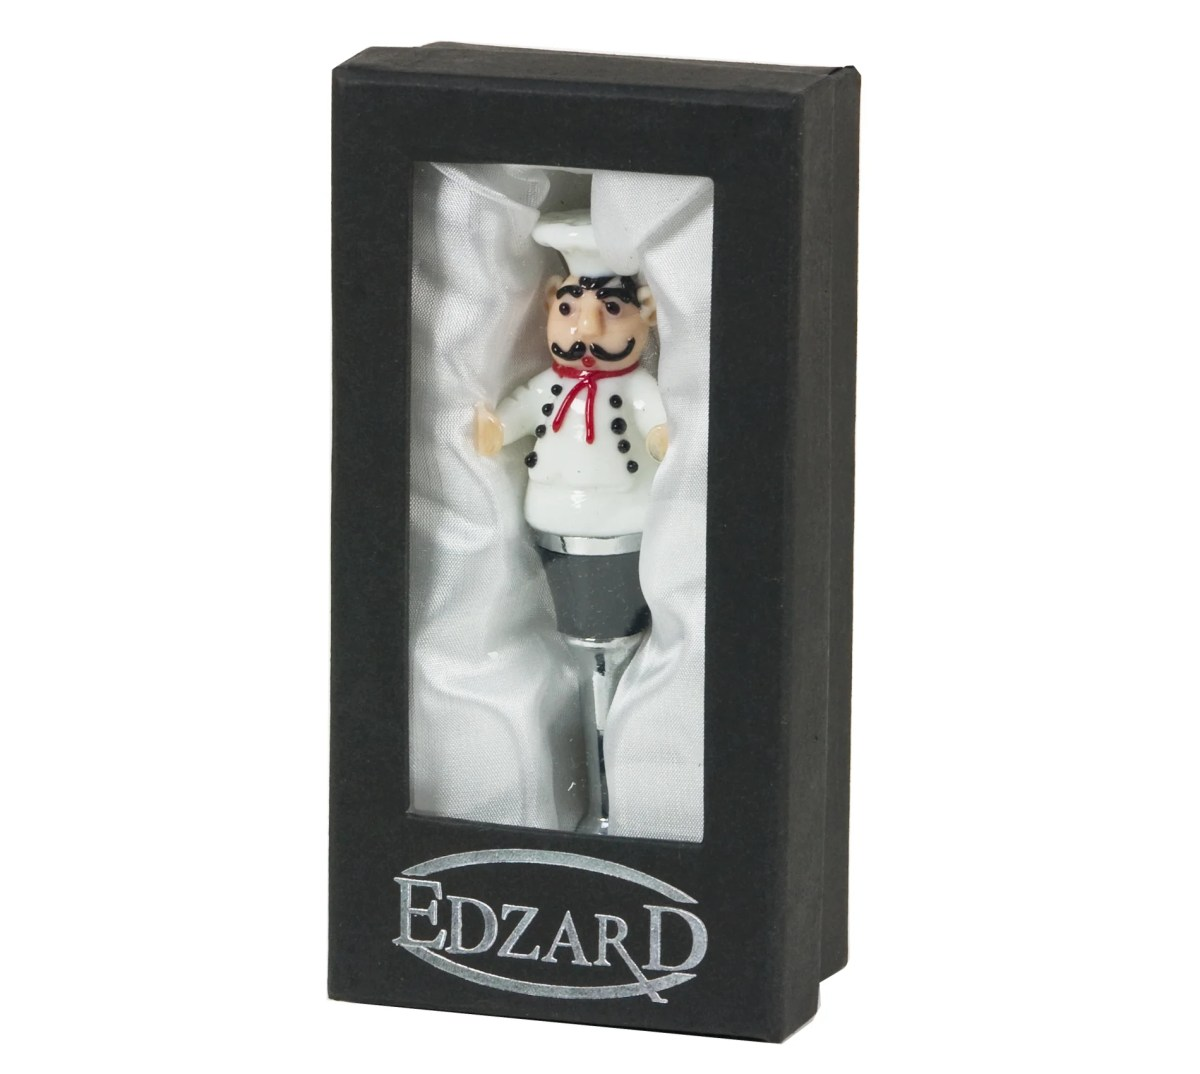 8543 Edzard Flaschenverschluss Weinverschluss Koch Sektverschluss Glaskorken